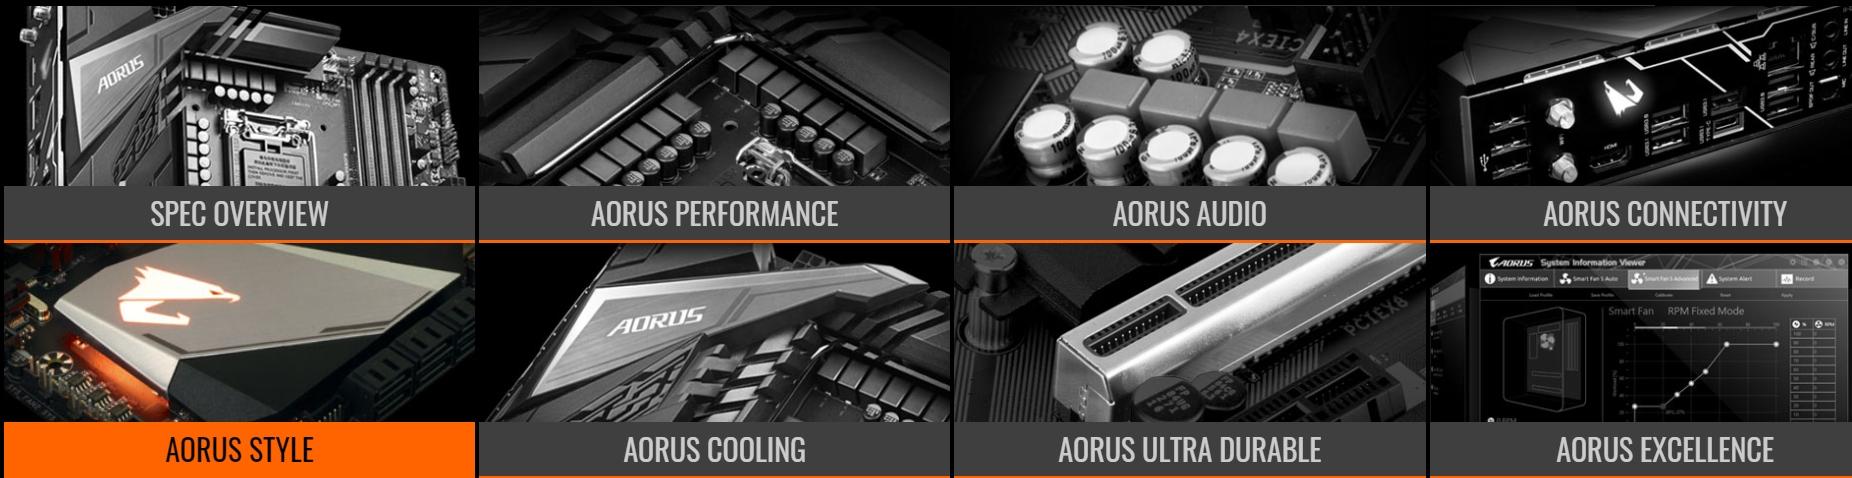 Gigabyte AMD X570 I AORUS Pro Wifi ITX Motherboard, AMD Ryzen, Dual PCIe  4 0 M 2, M 2 Thermal Guard,